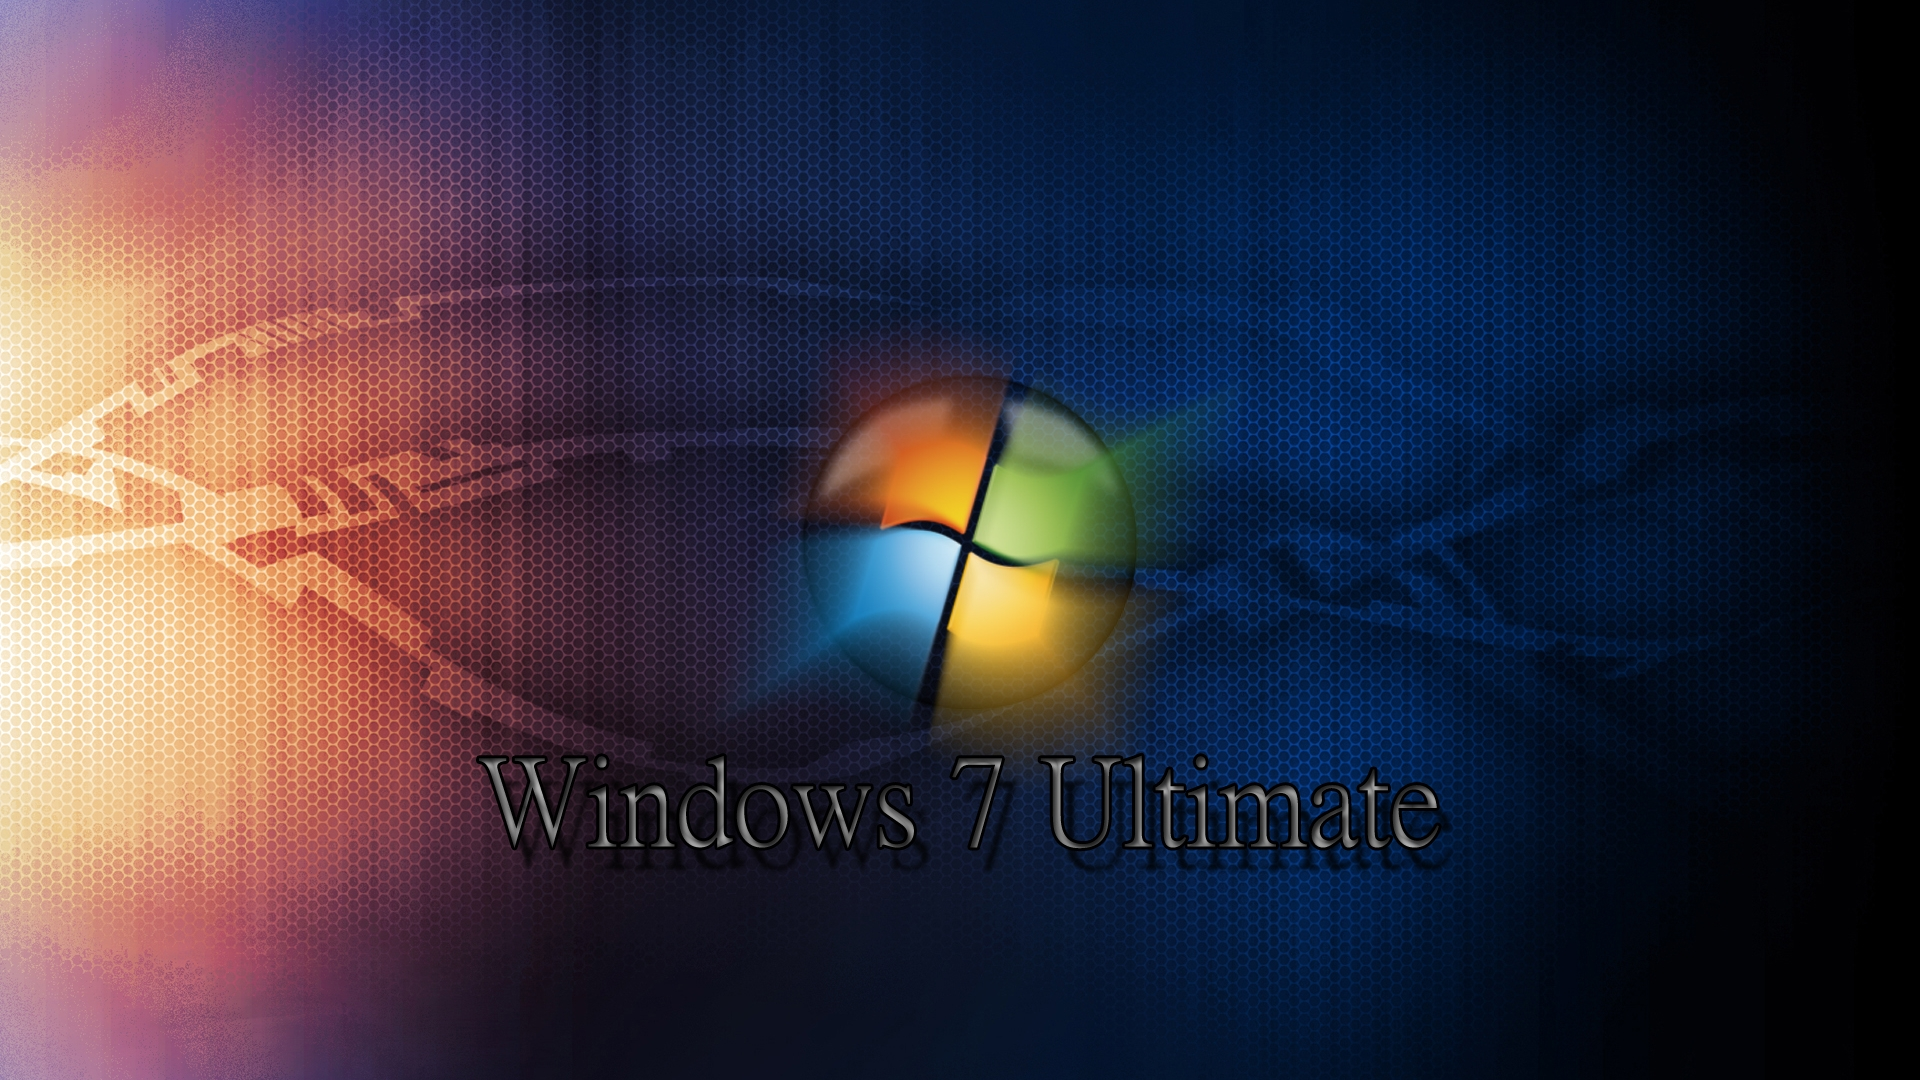 download Technet Microsoft wallpaper 138545 [1920x1200] for 1920x1080